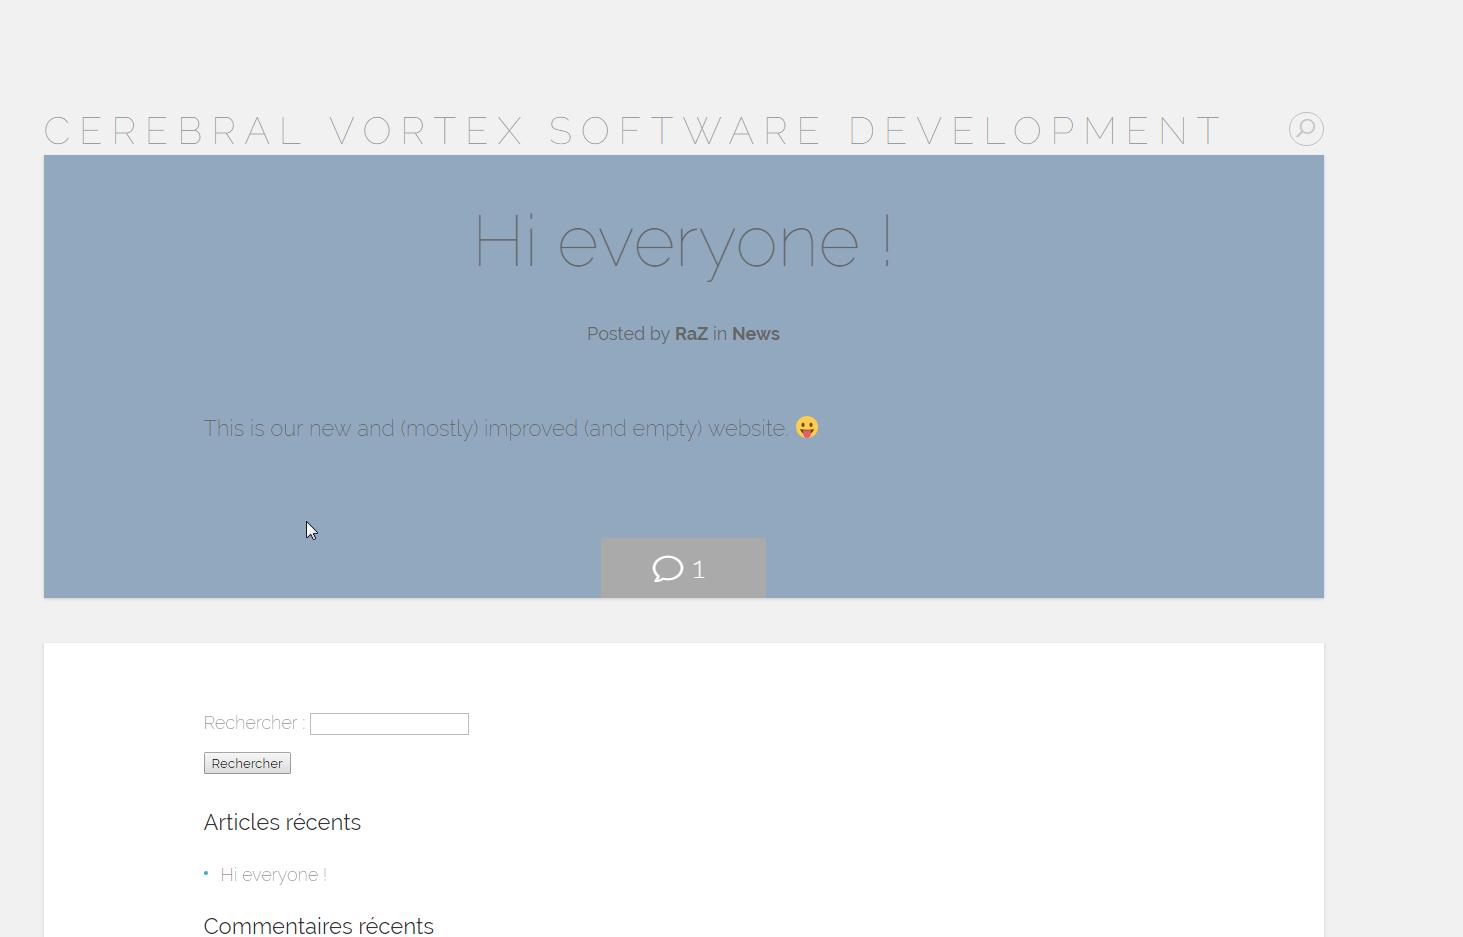 Screenshot of website Cerebral Vortex